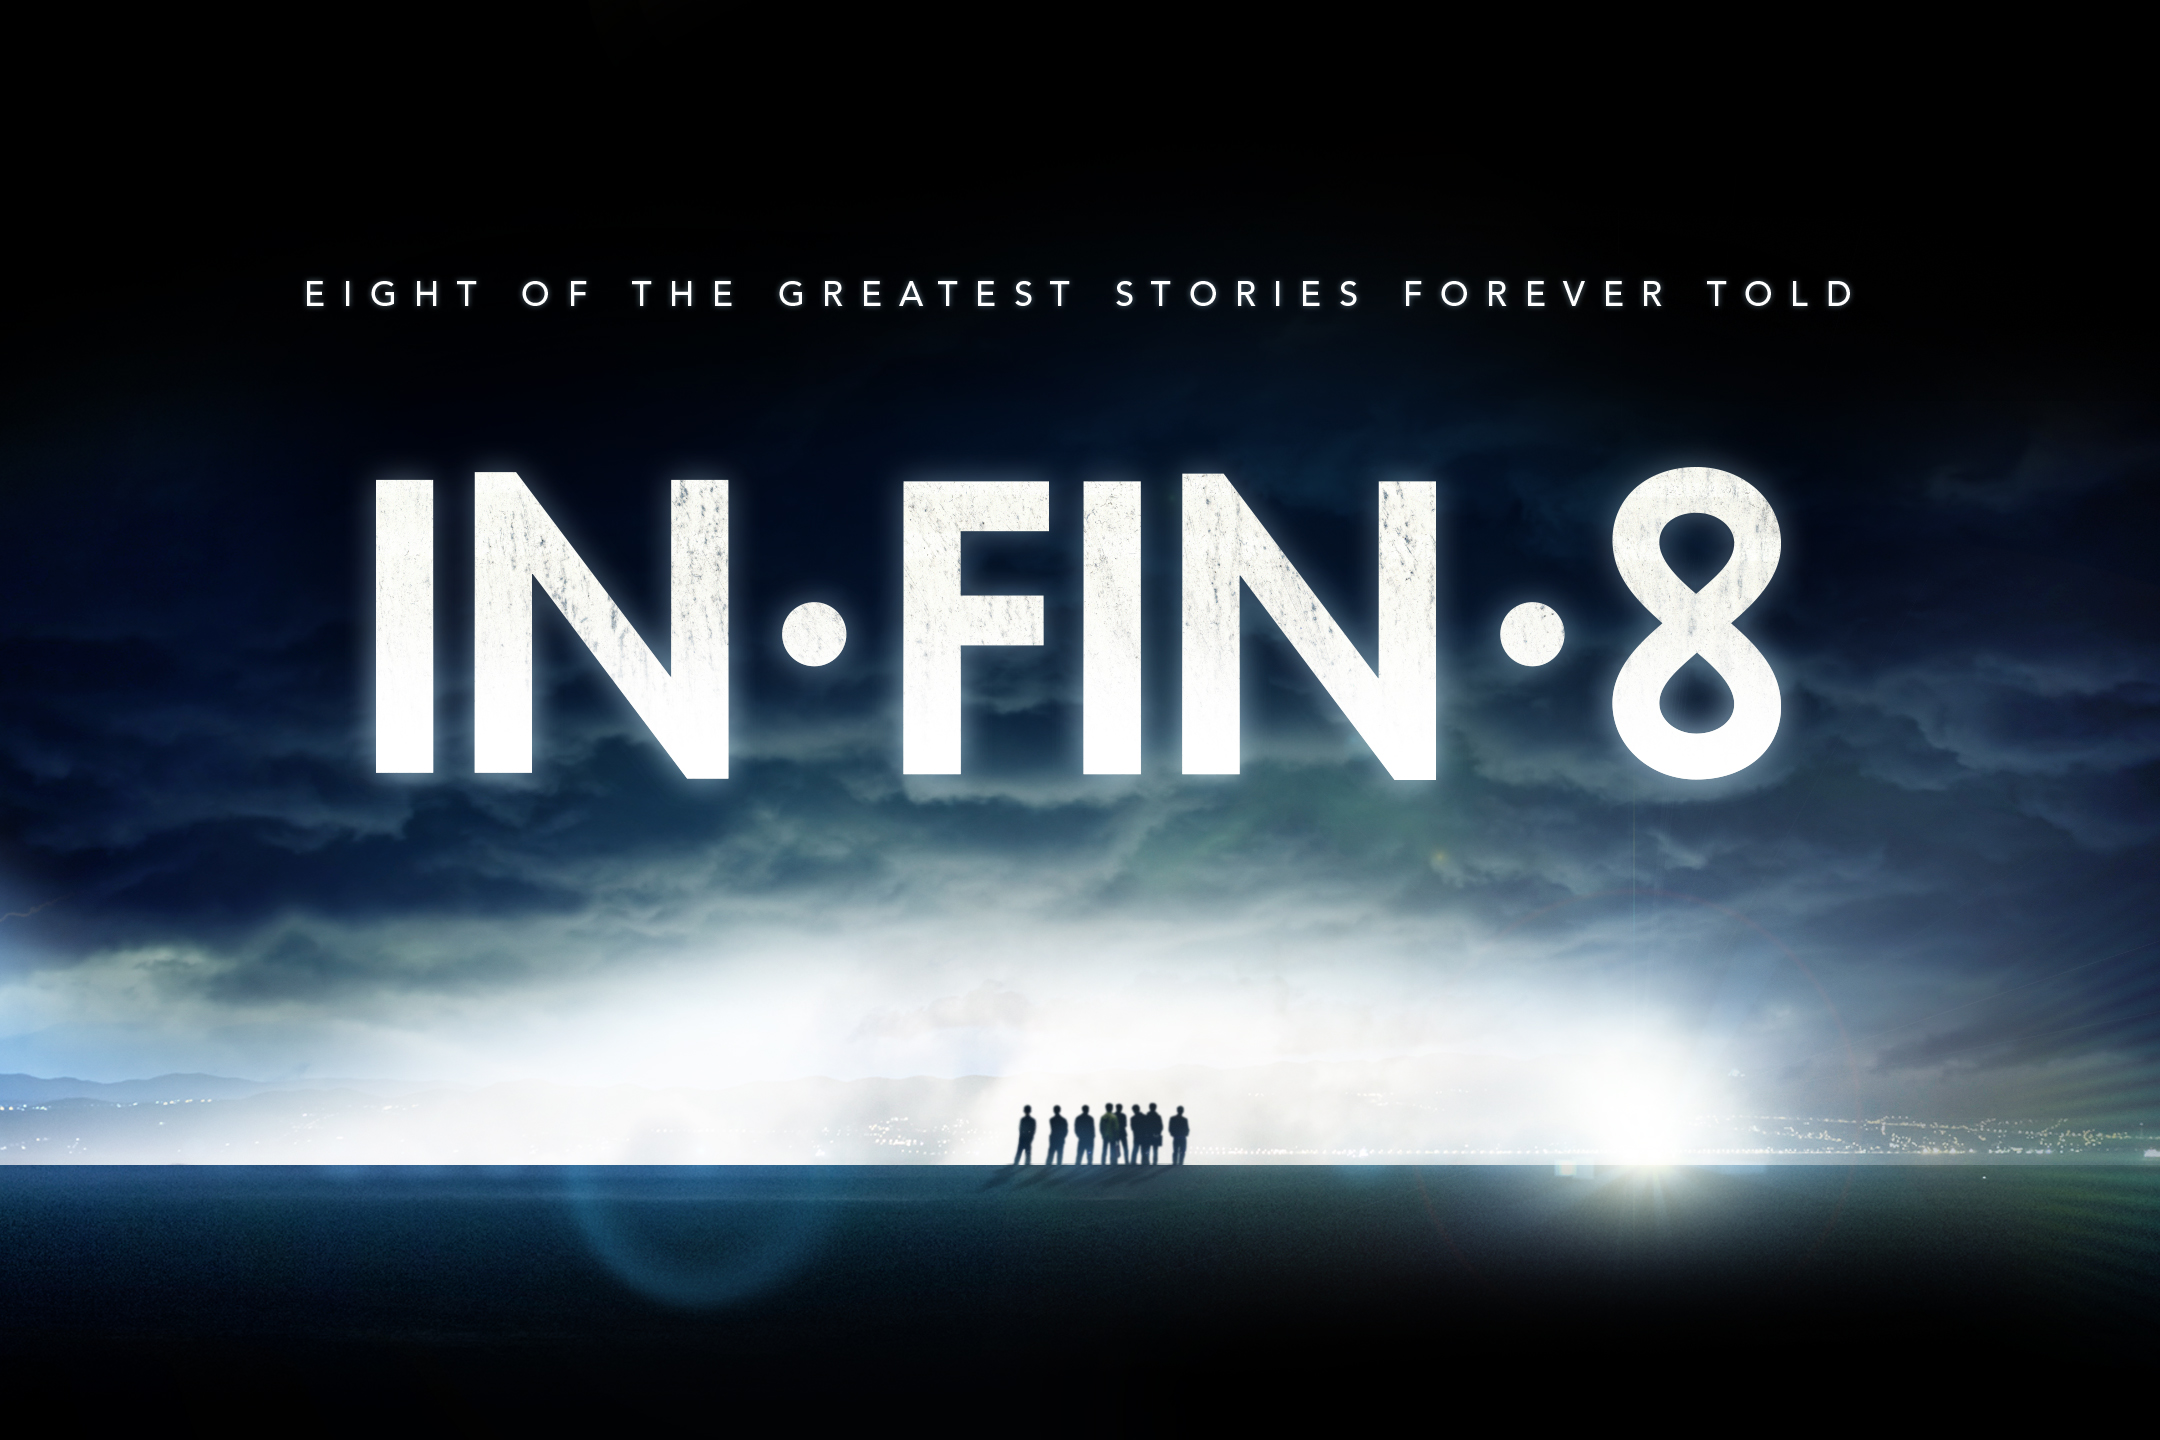 infin8 graphic.jpg